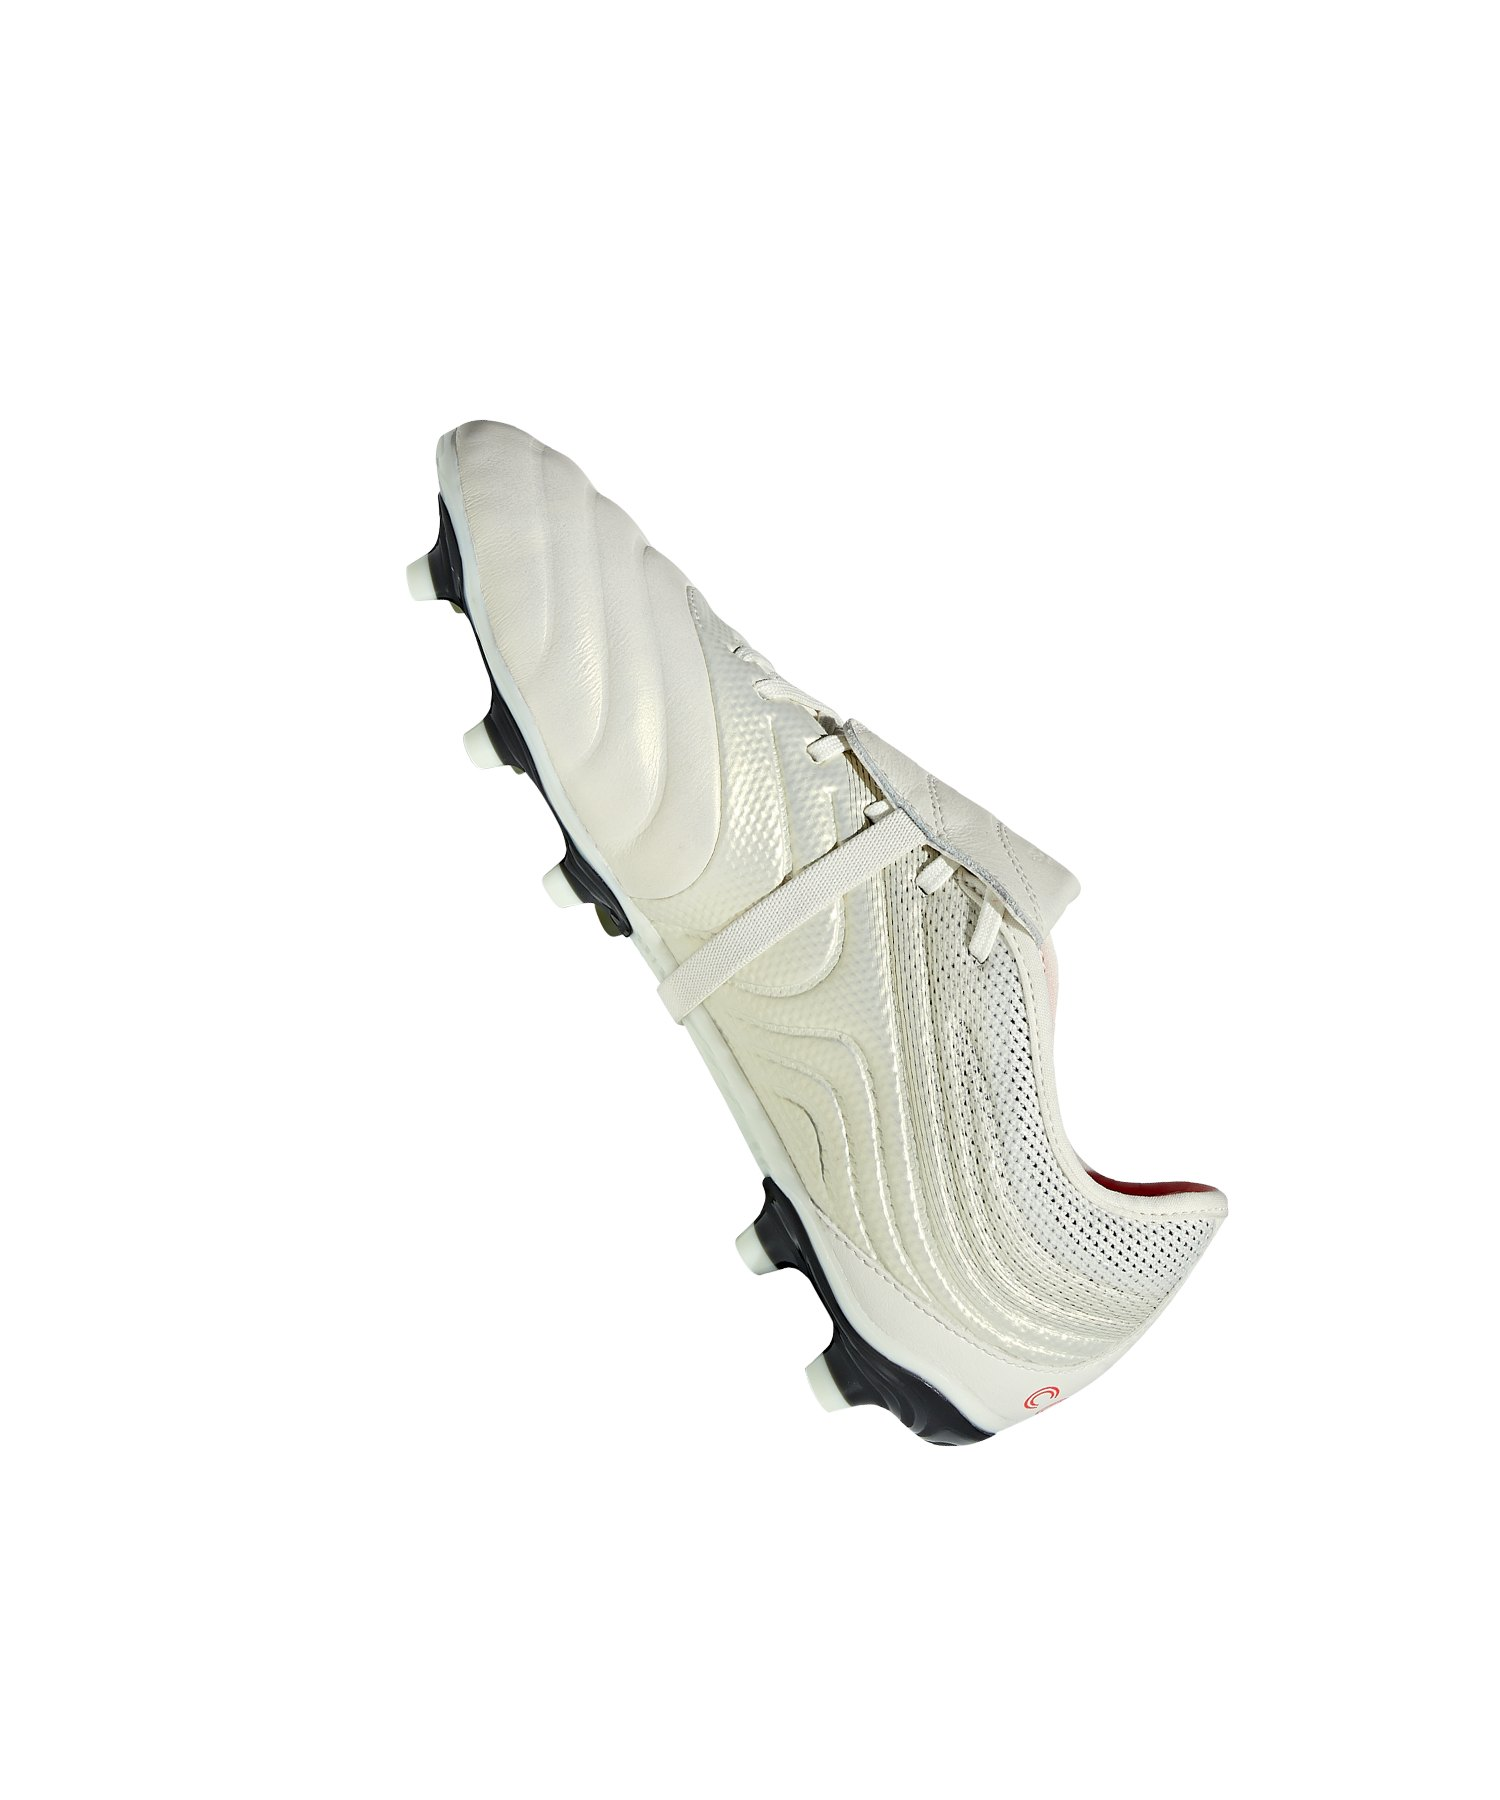 reputable site f515f 6259c ... adidas COPA Gloro 19.2 FG Weiss Rot - weiss ...